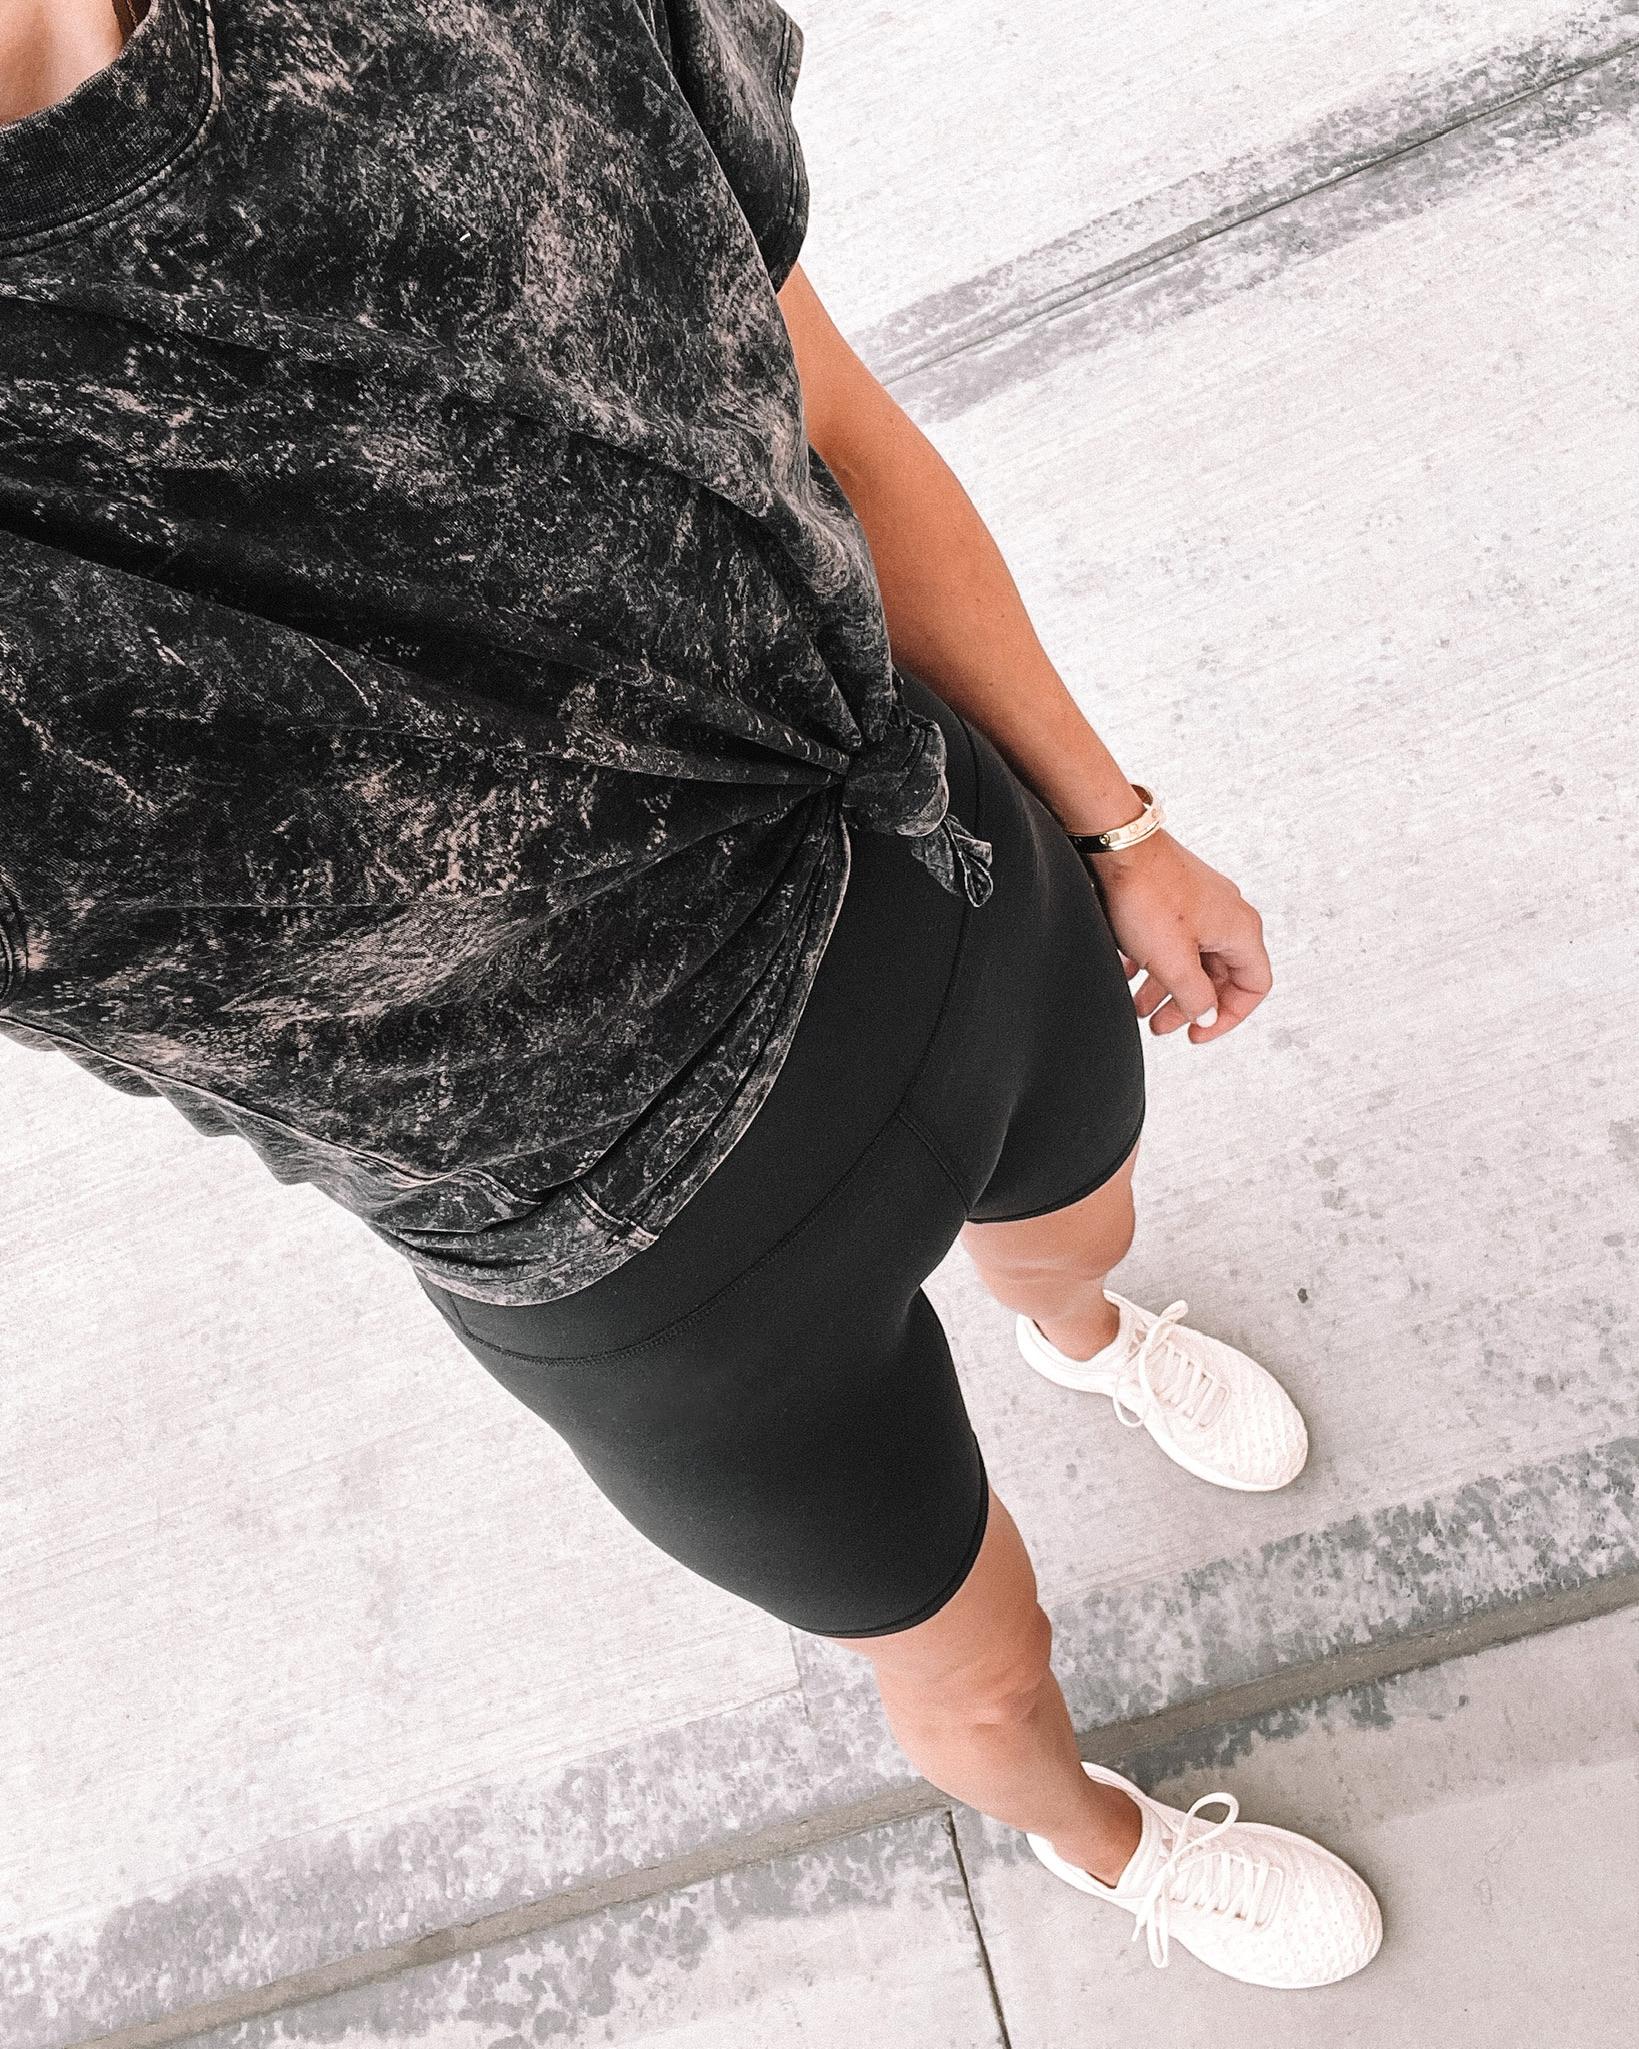 Fashion Jackson Wearing lululemon Black Tie Dye Tshirt lululemon Black Align Biker Shorts APL Sneakers workout outfits for women